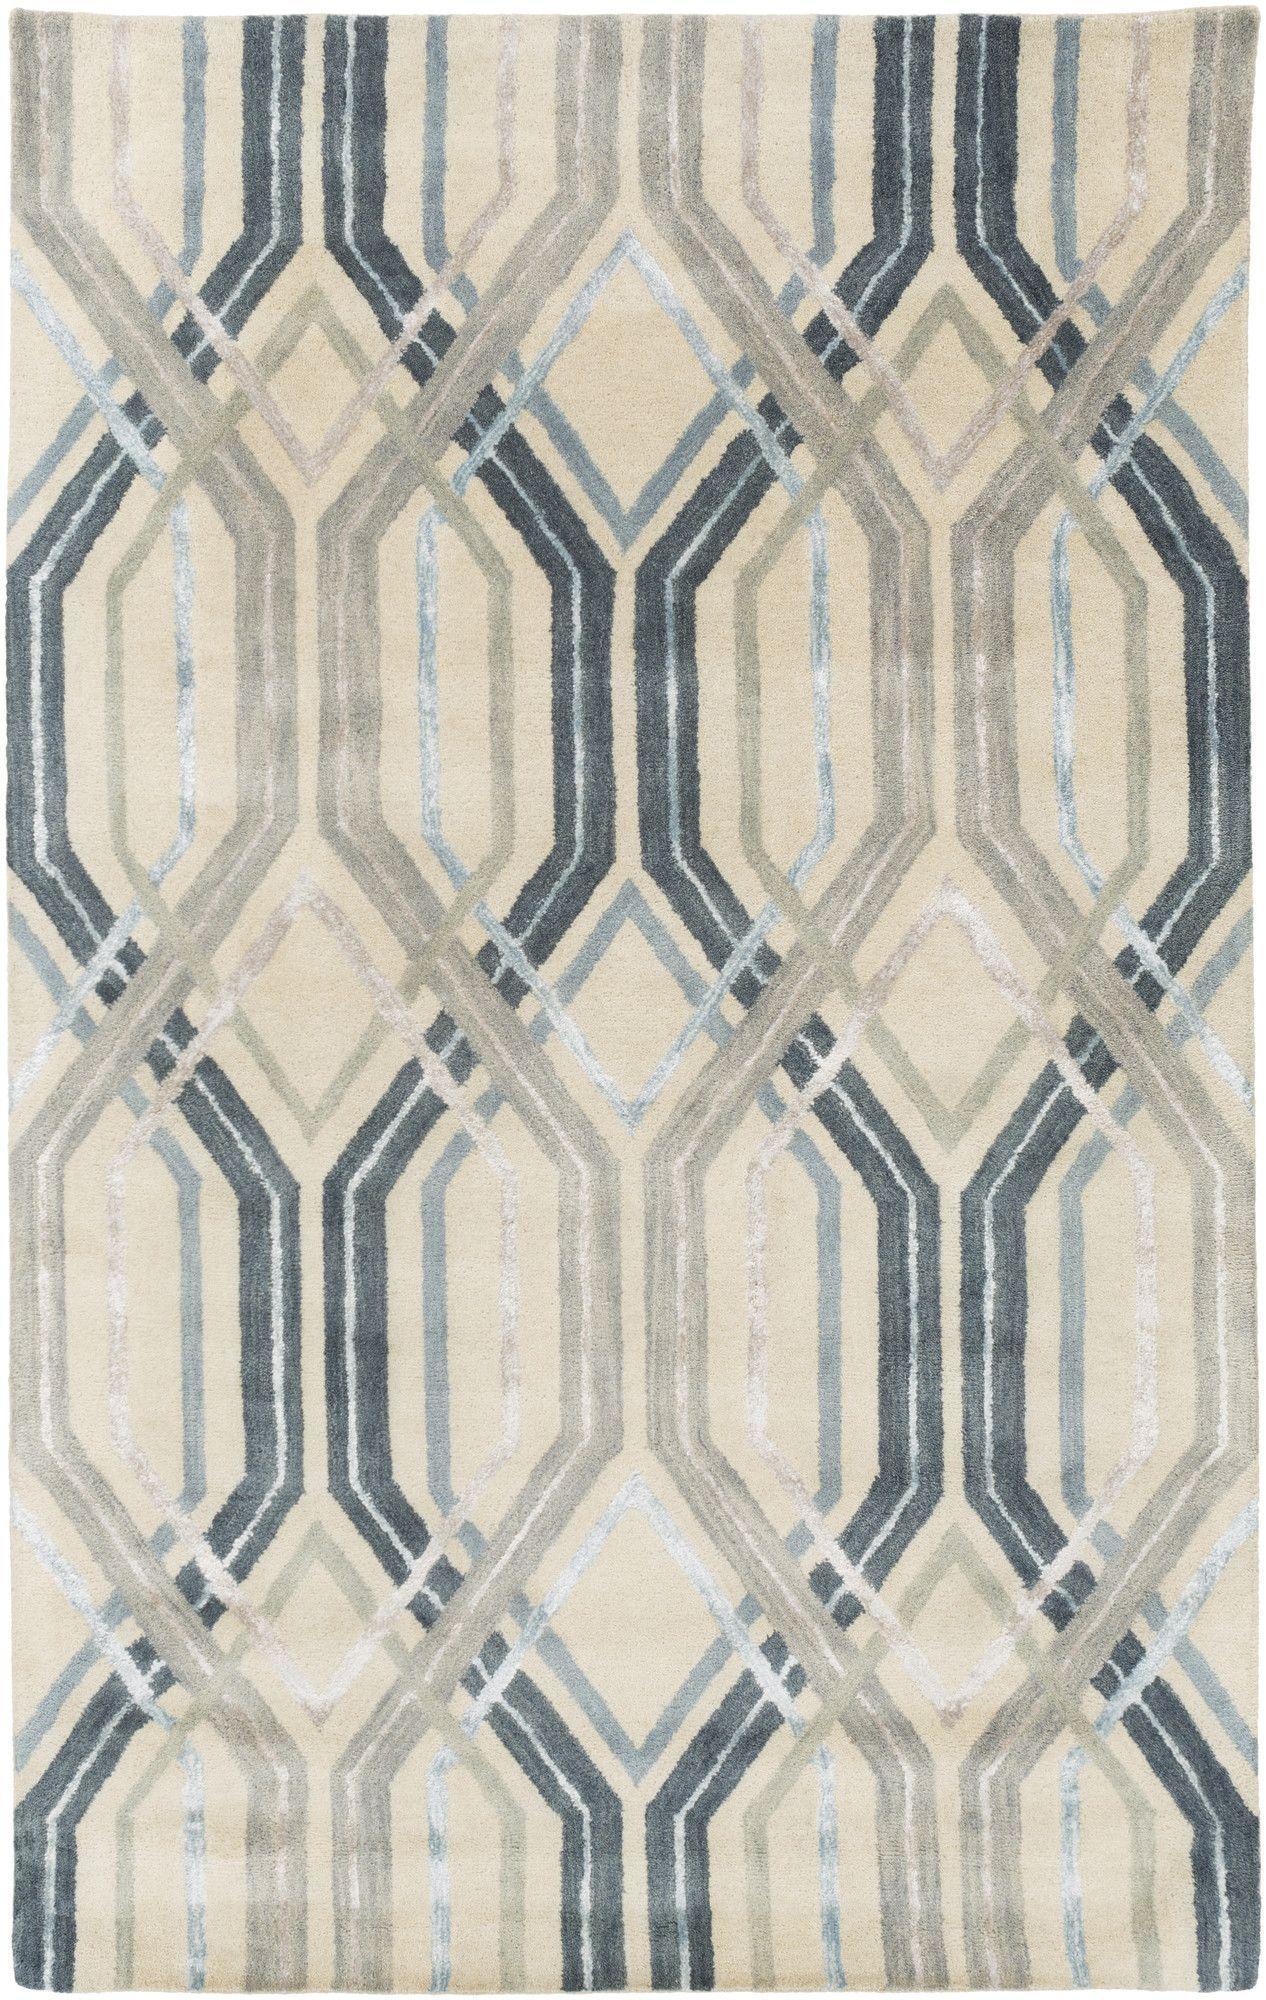 Dewit Hand-Tufted Charcoal/Slate Area Rug